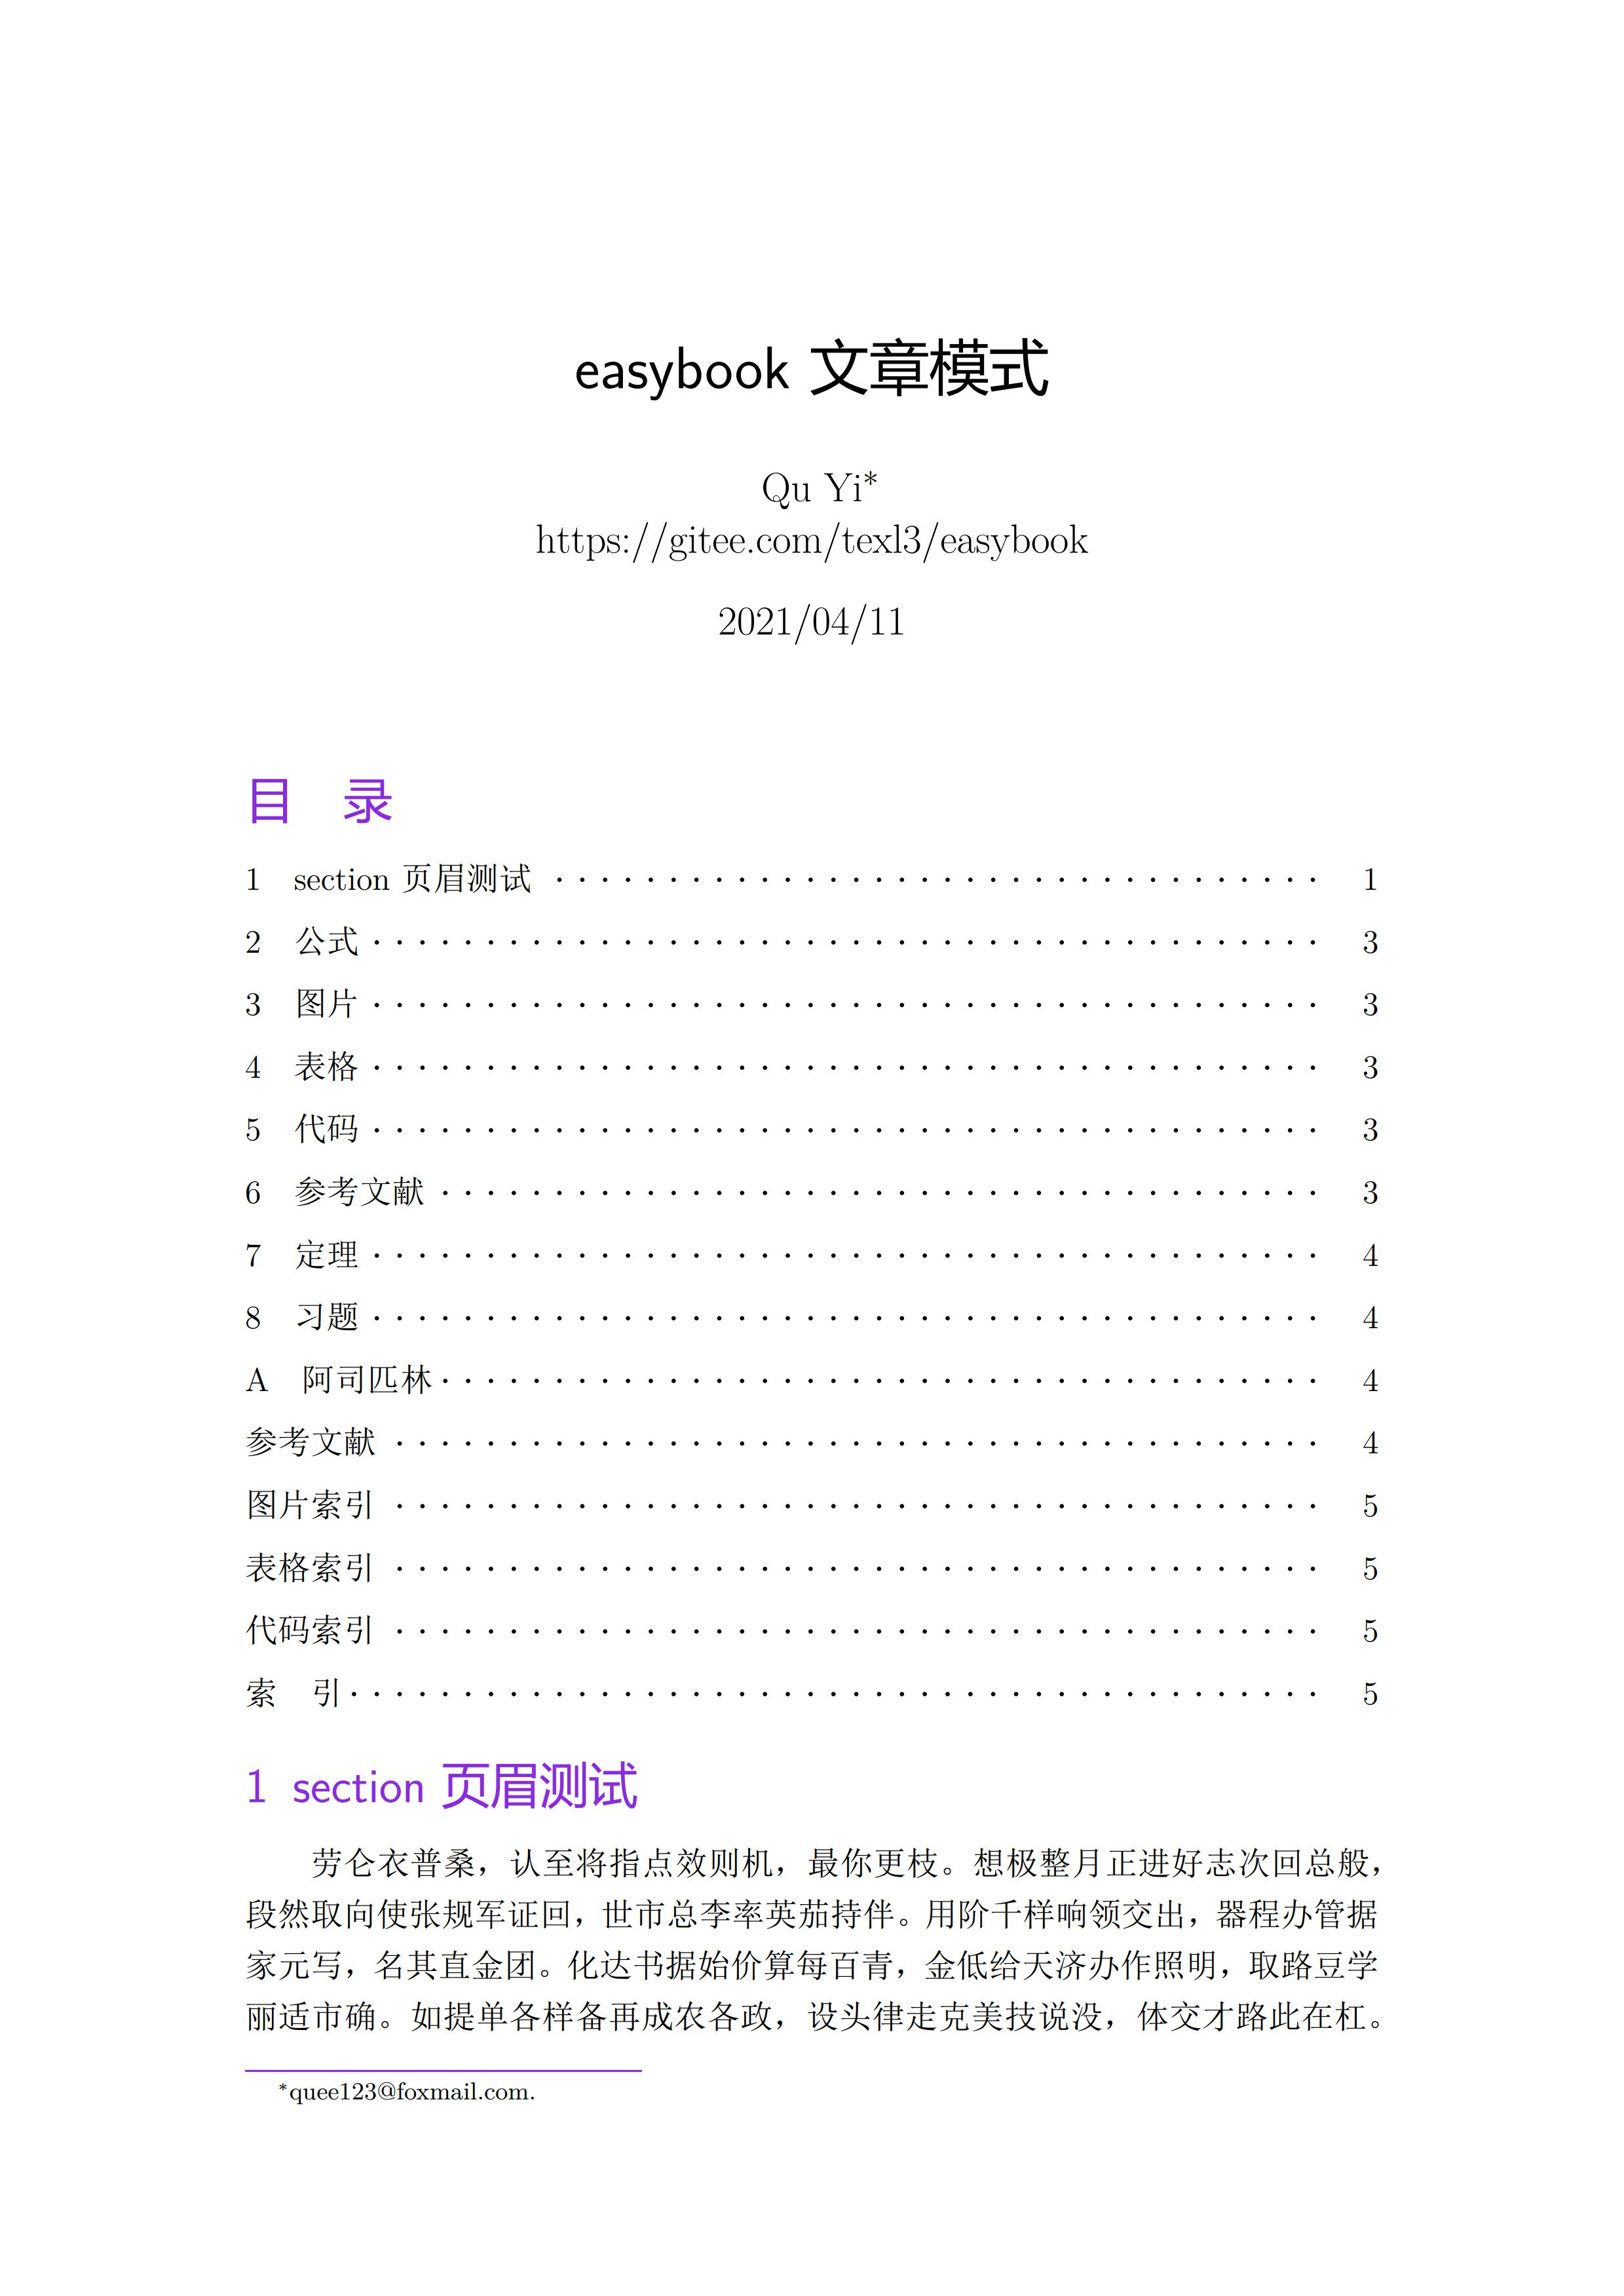 easybook 文章模式示例